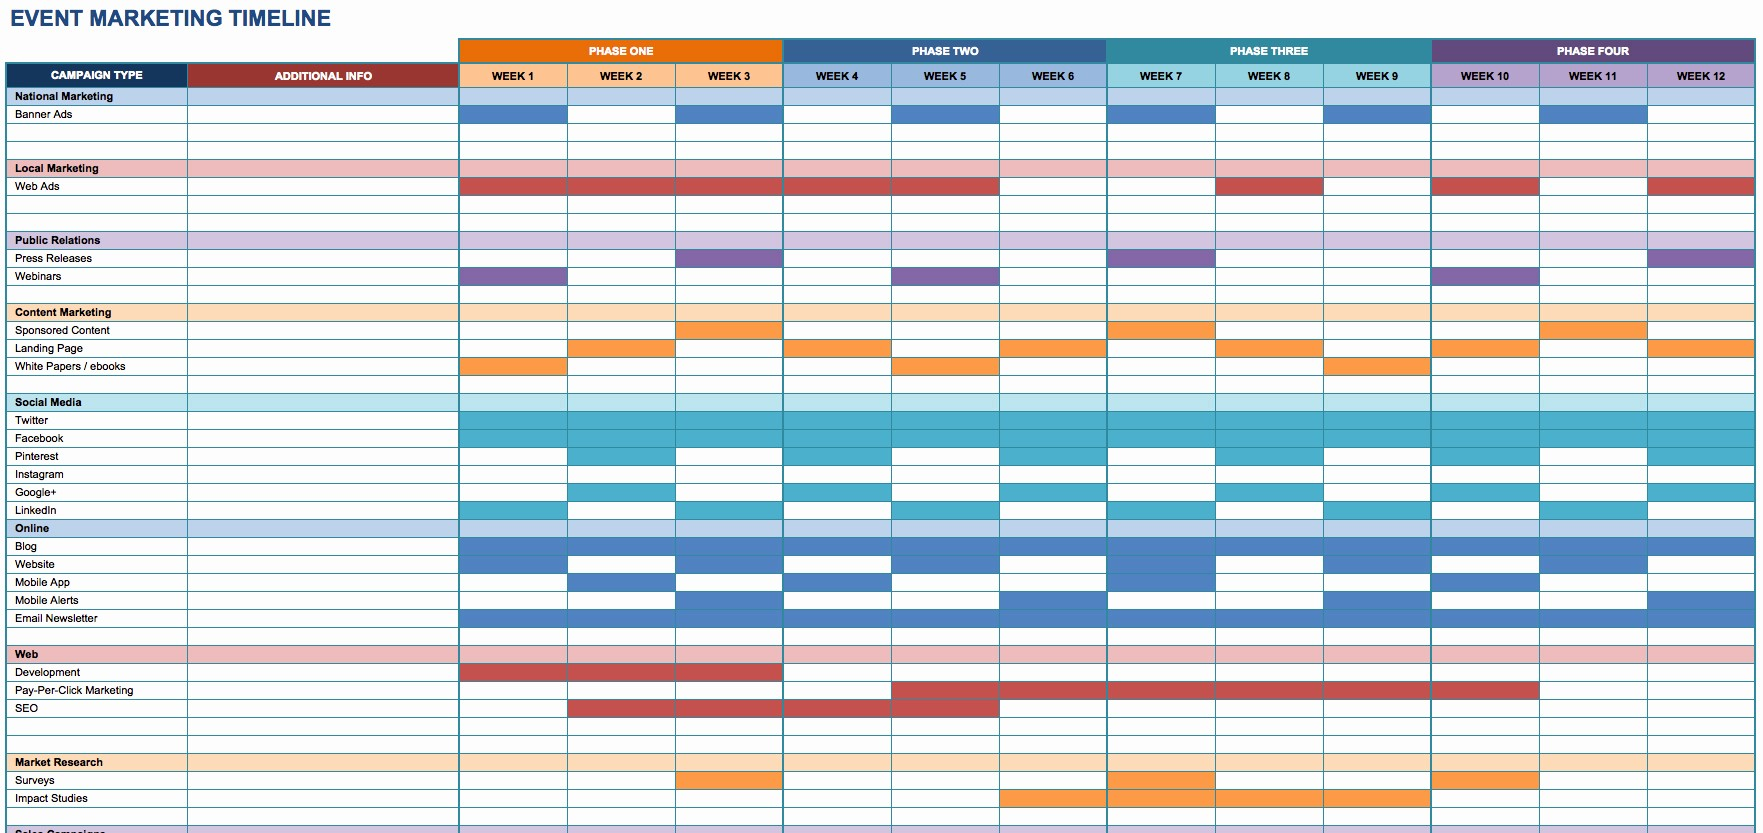 Event Planning Timeline Template Excel Best Of event Timeline Template Excel